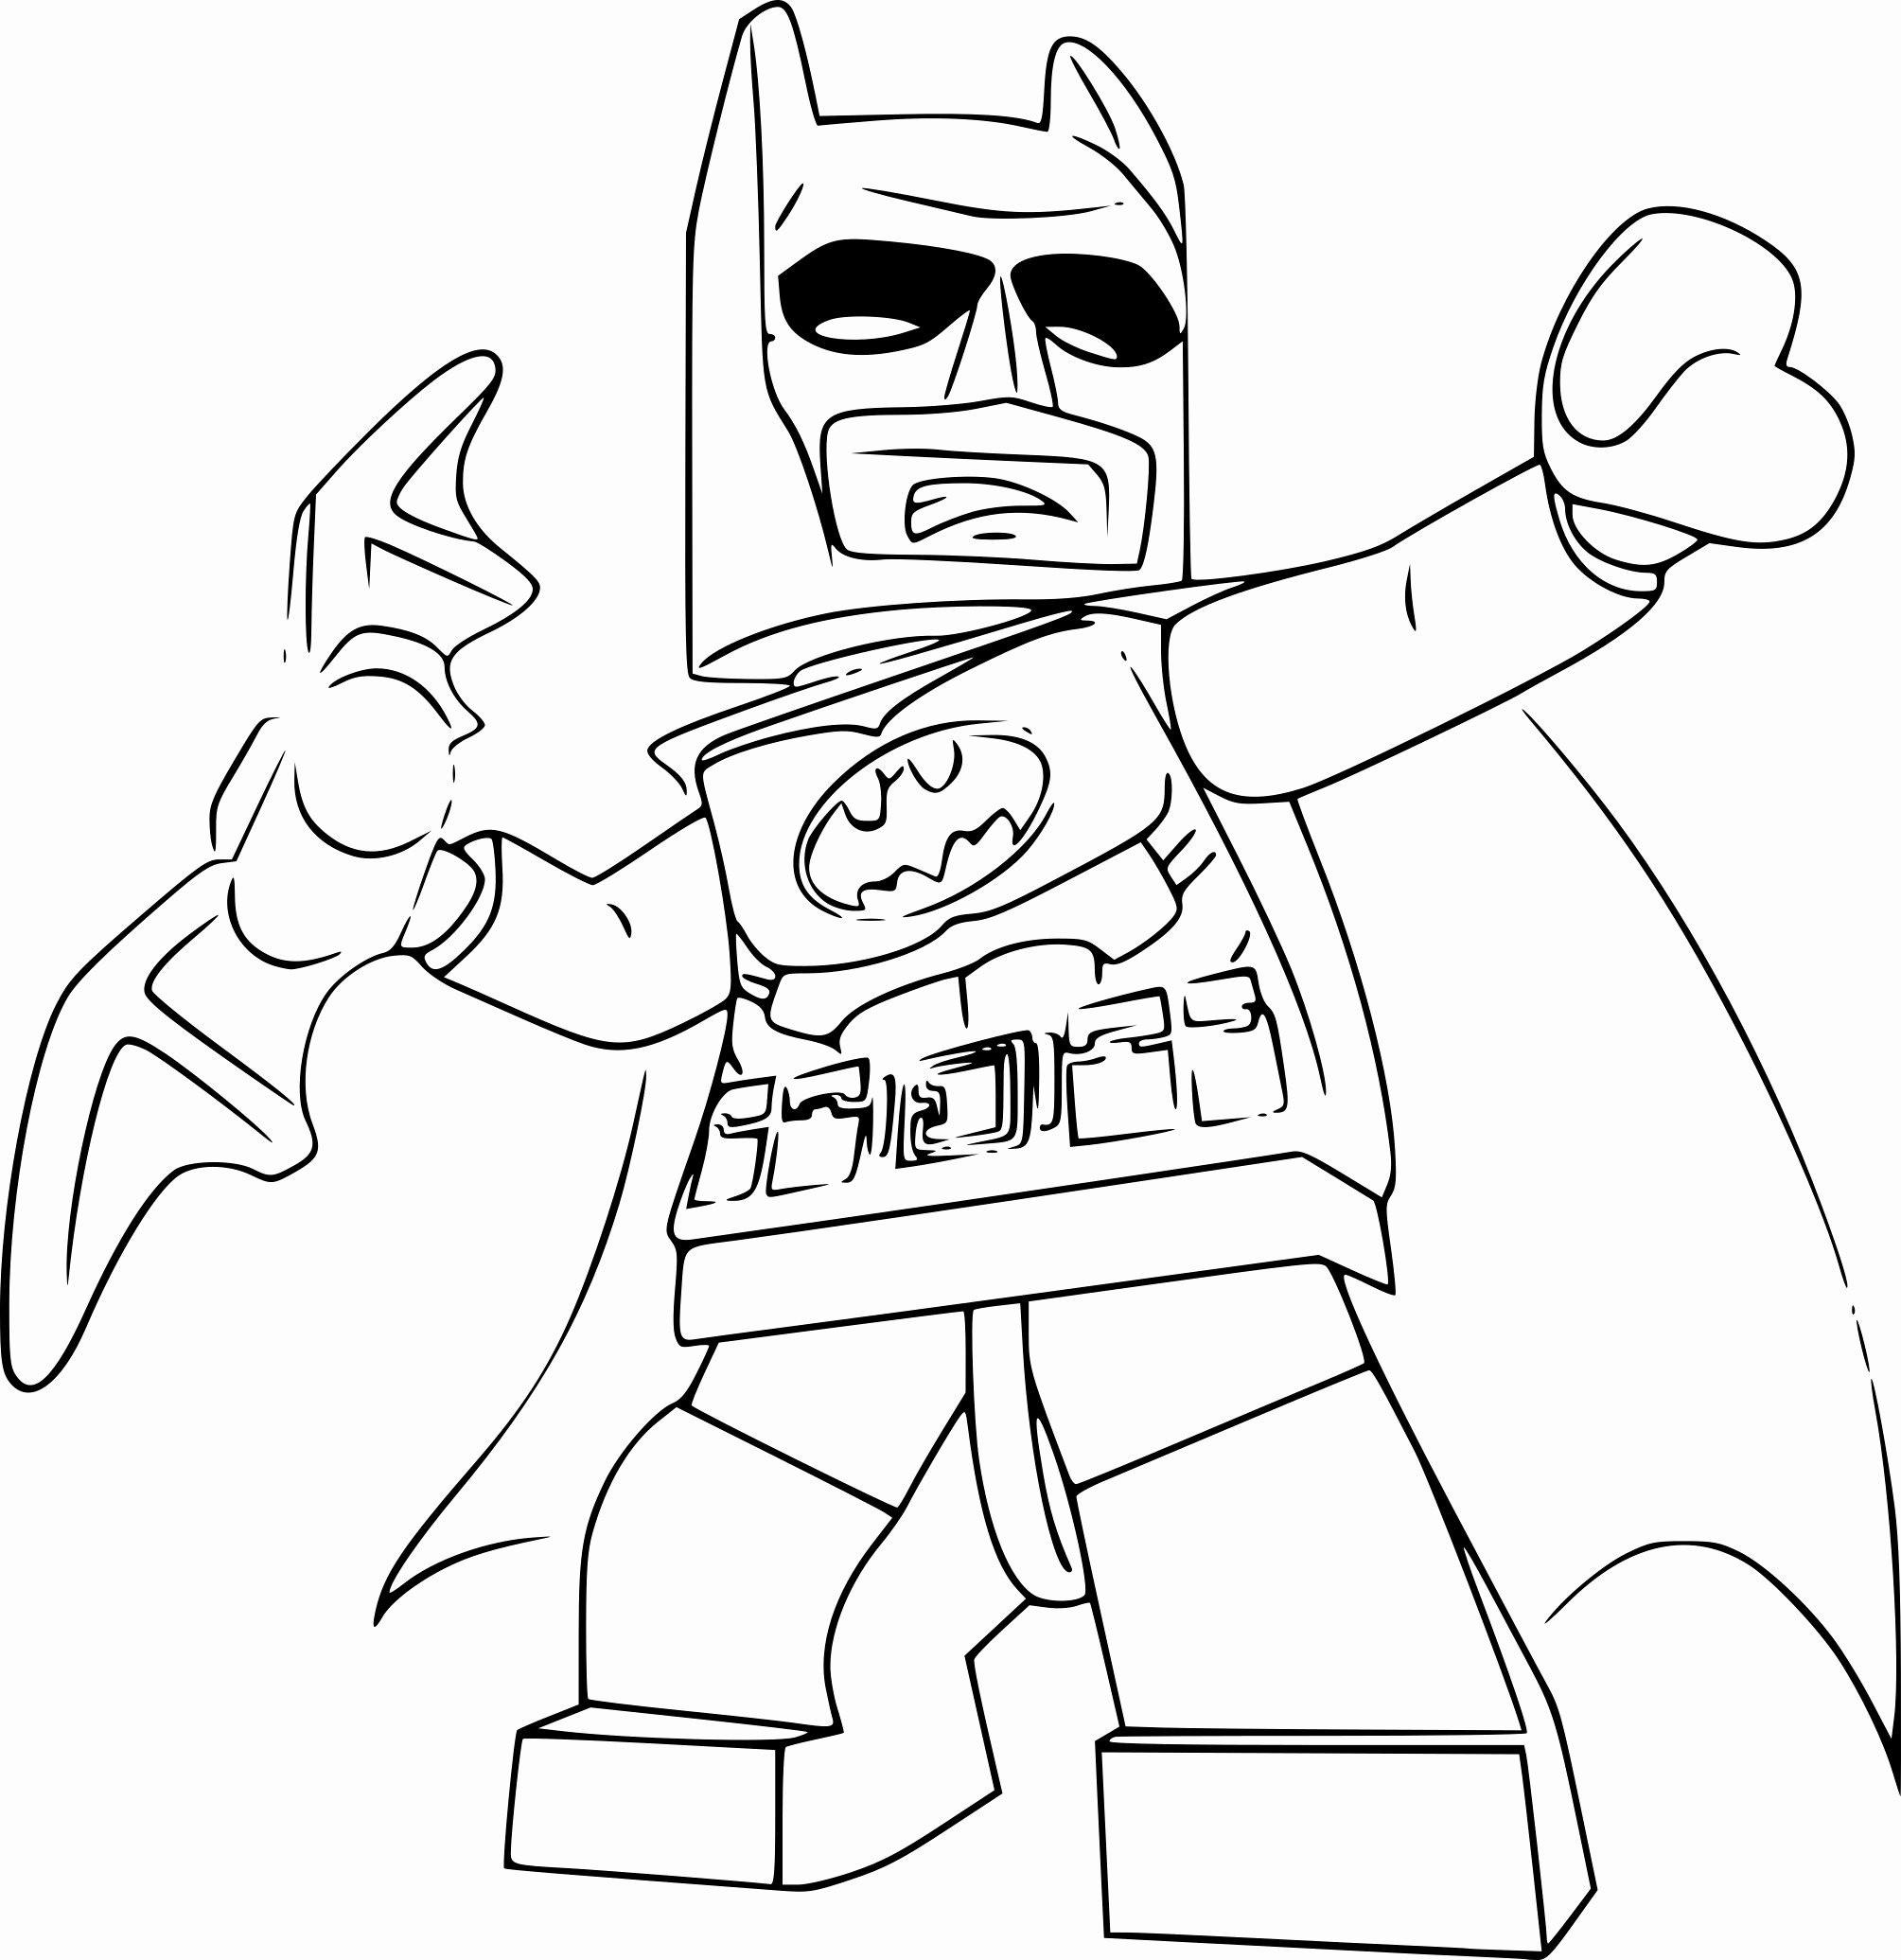 Ausmalbild Lego Batman Inspirierend Ausmalbilder Panther Luxury 37 Wow Ausmalbilder Scoredatscore Galerie